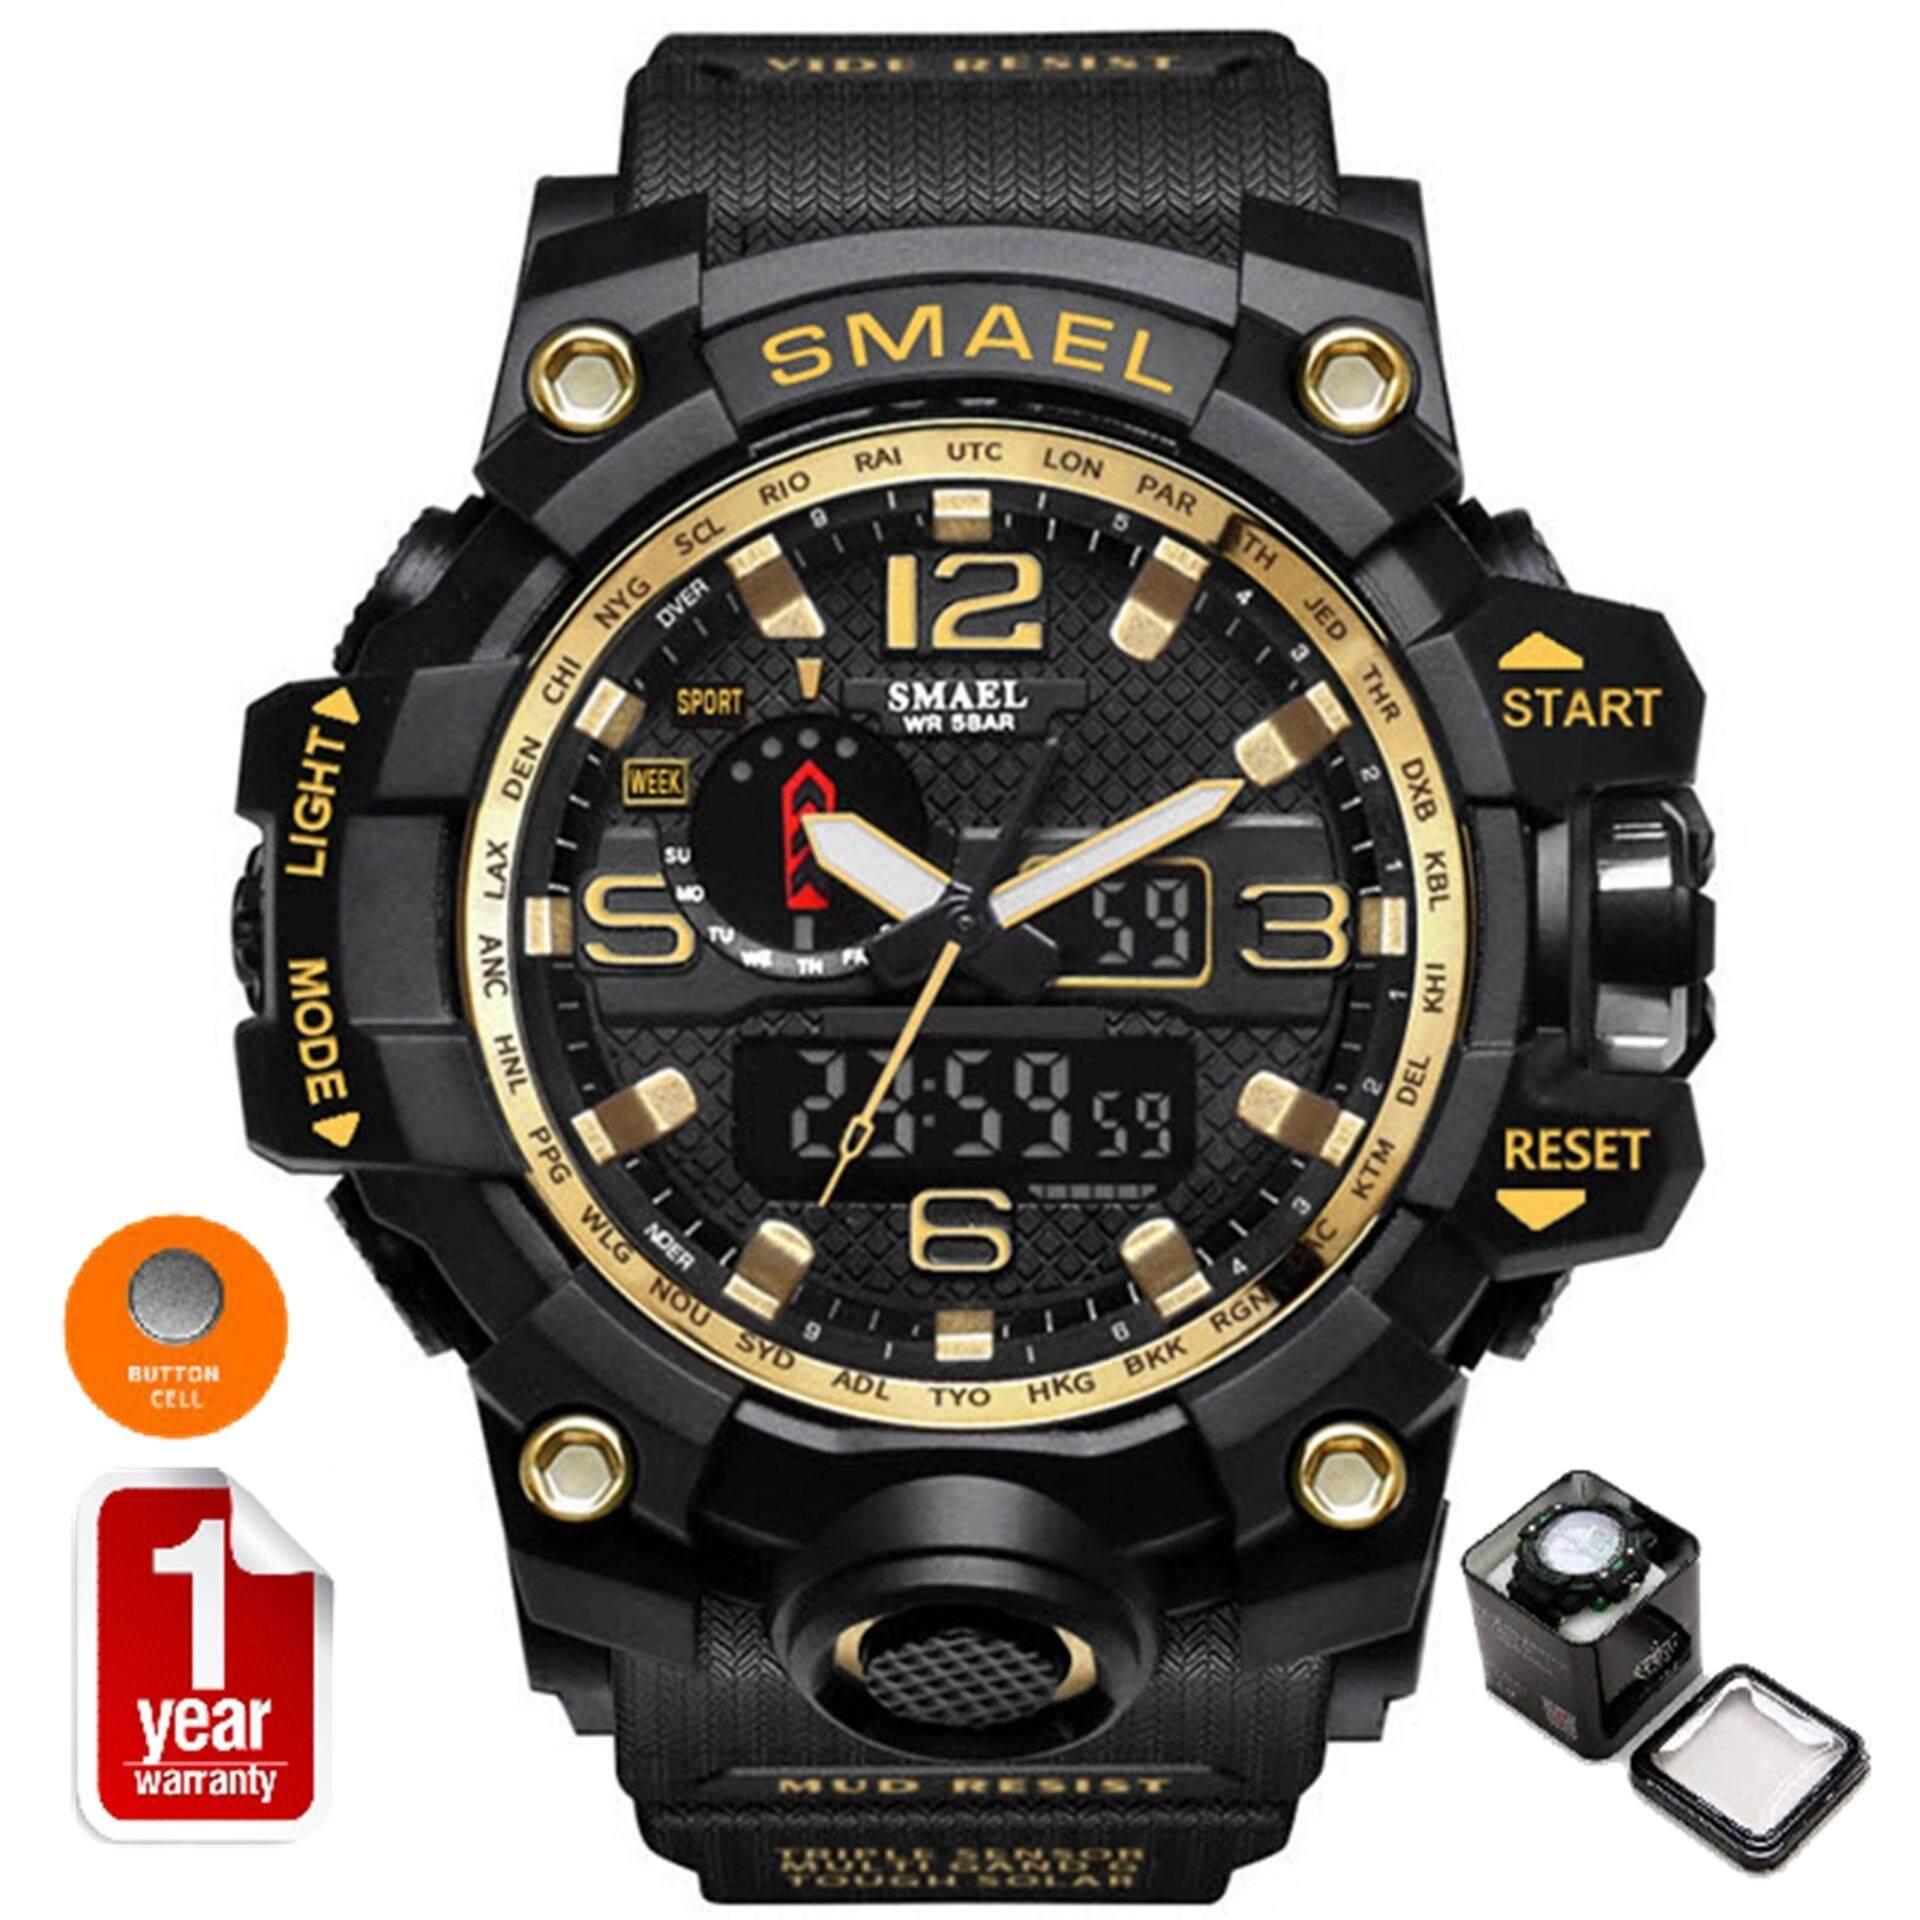 Smael นาฬิกาข้อมือผู้ชาย Sport Digital Led รุ่น Sm1545 (black/yellow).